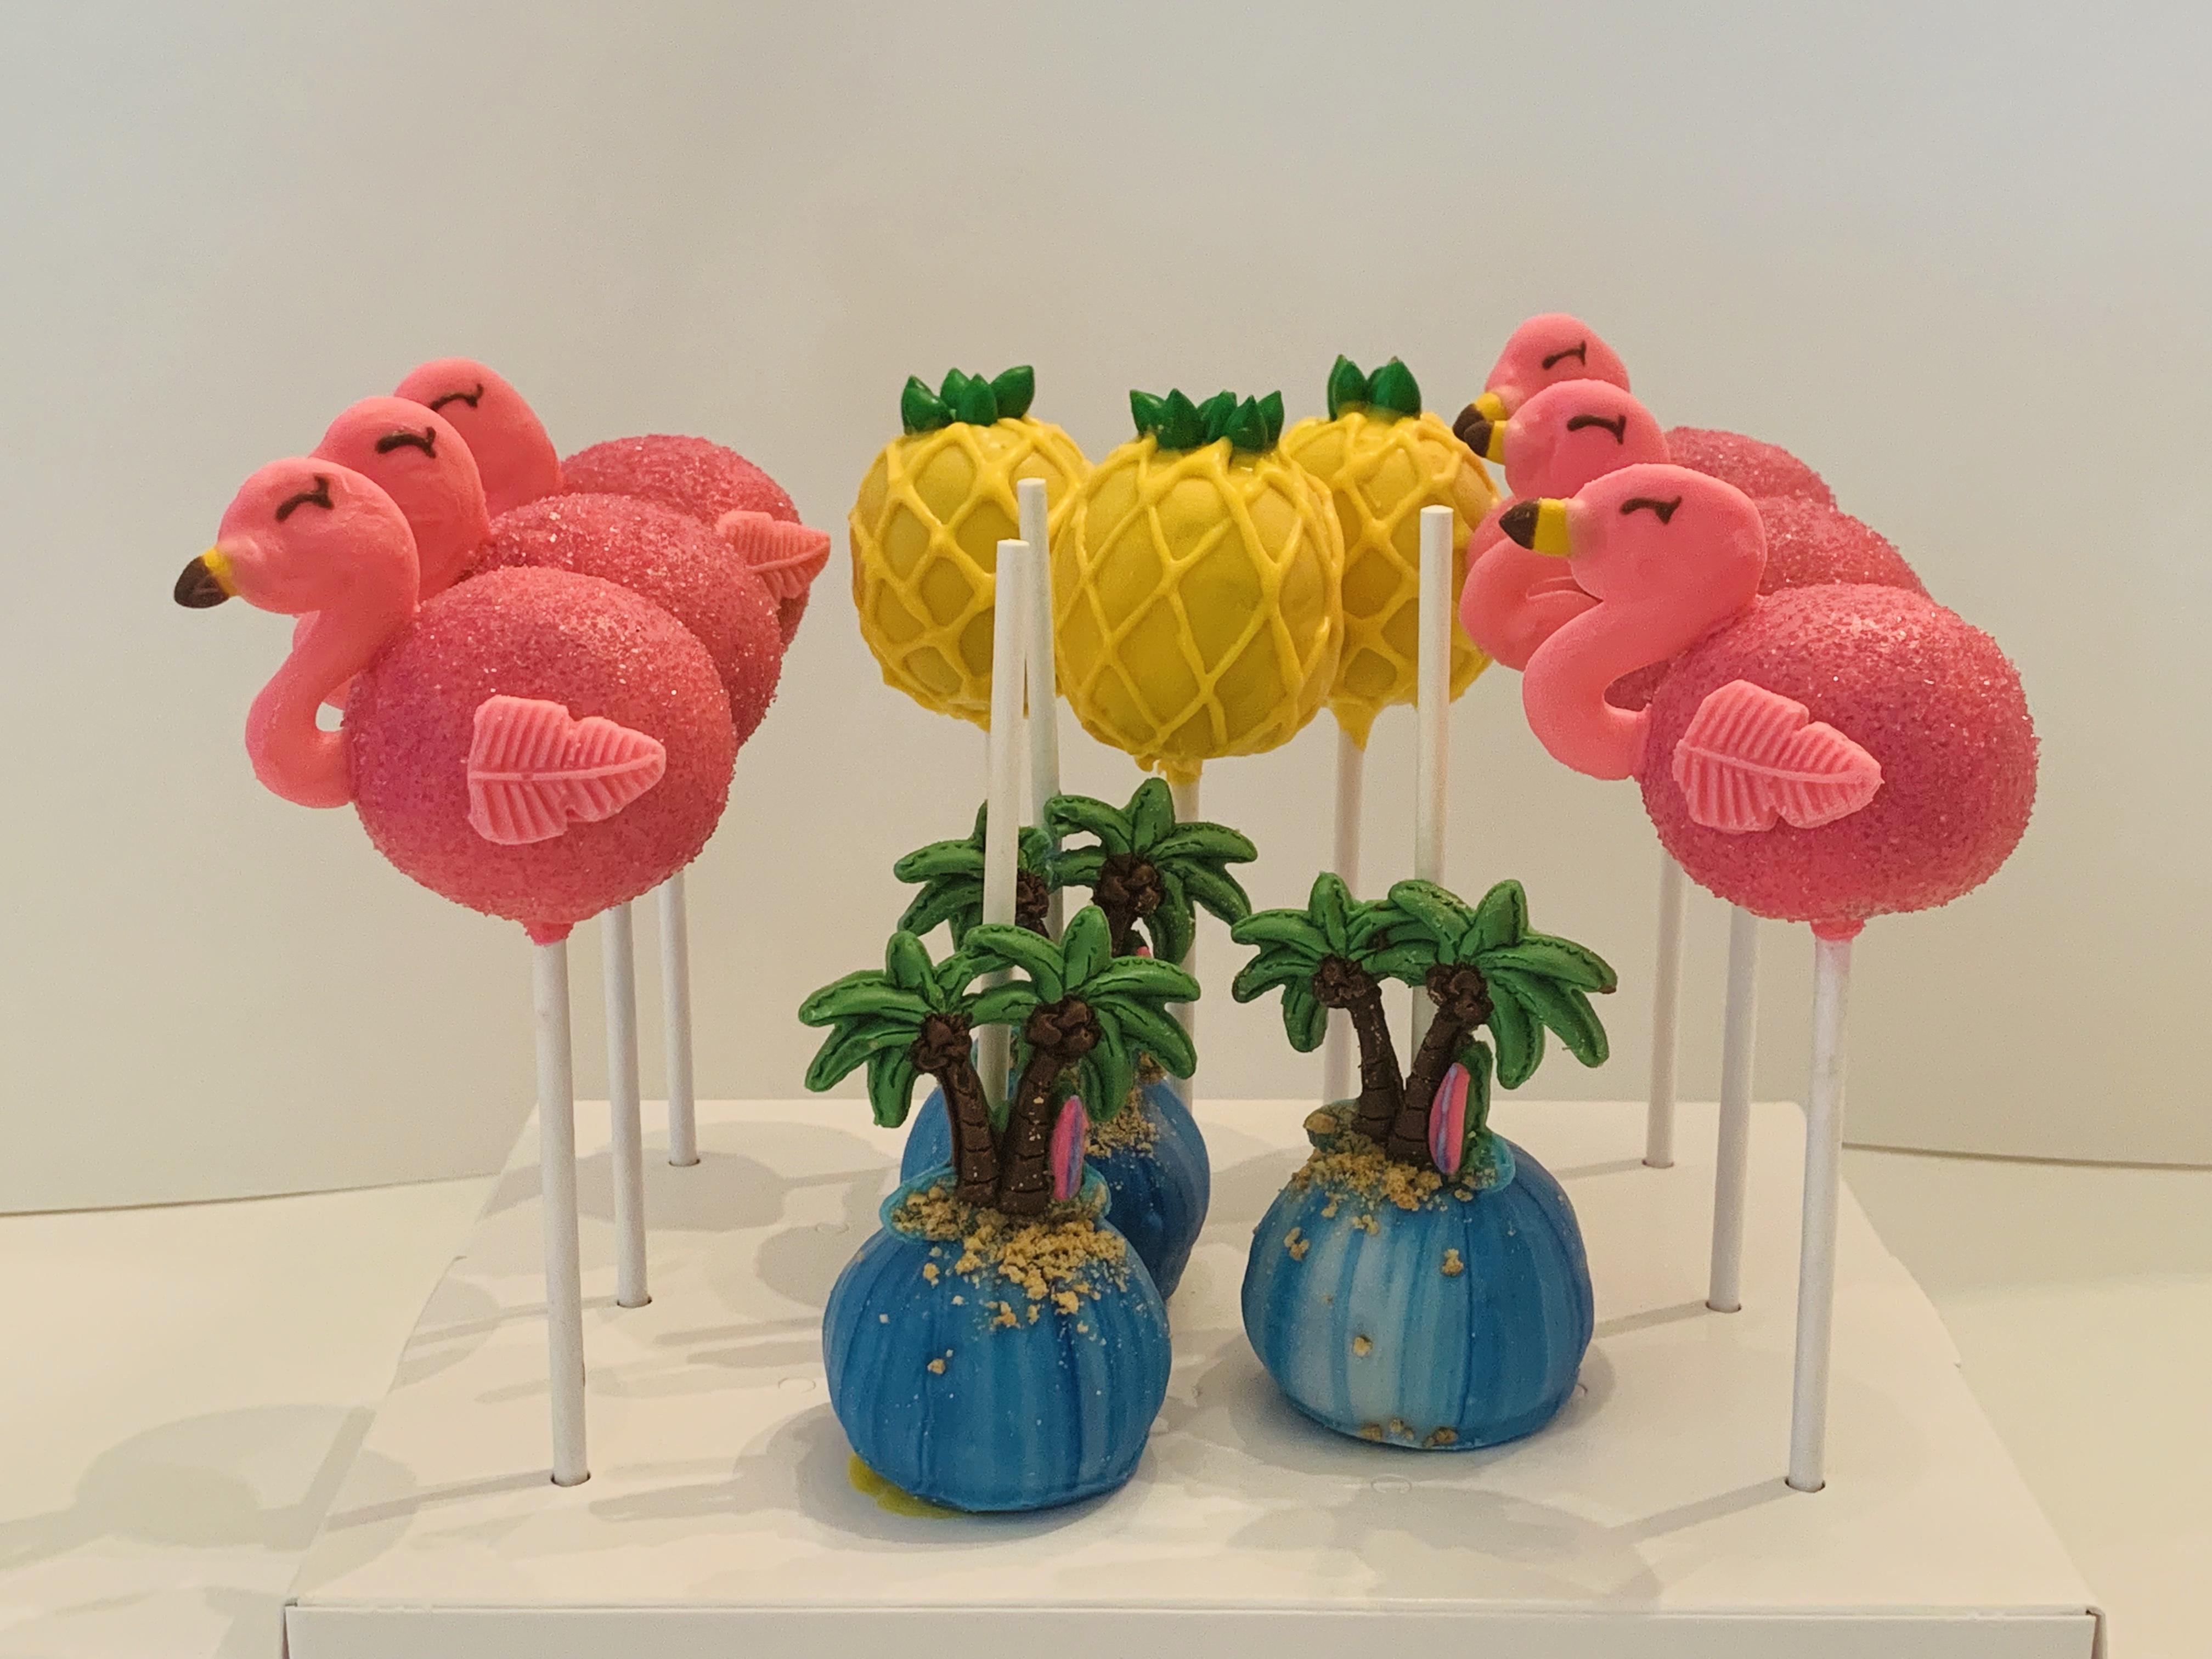 https://0201.nccdn.net/1_2/000/000/107/7ea/Flamingo-4032x3024.jpg